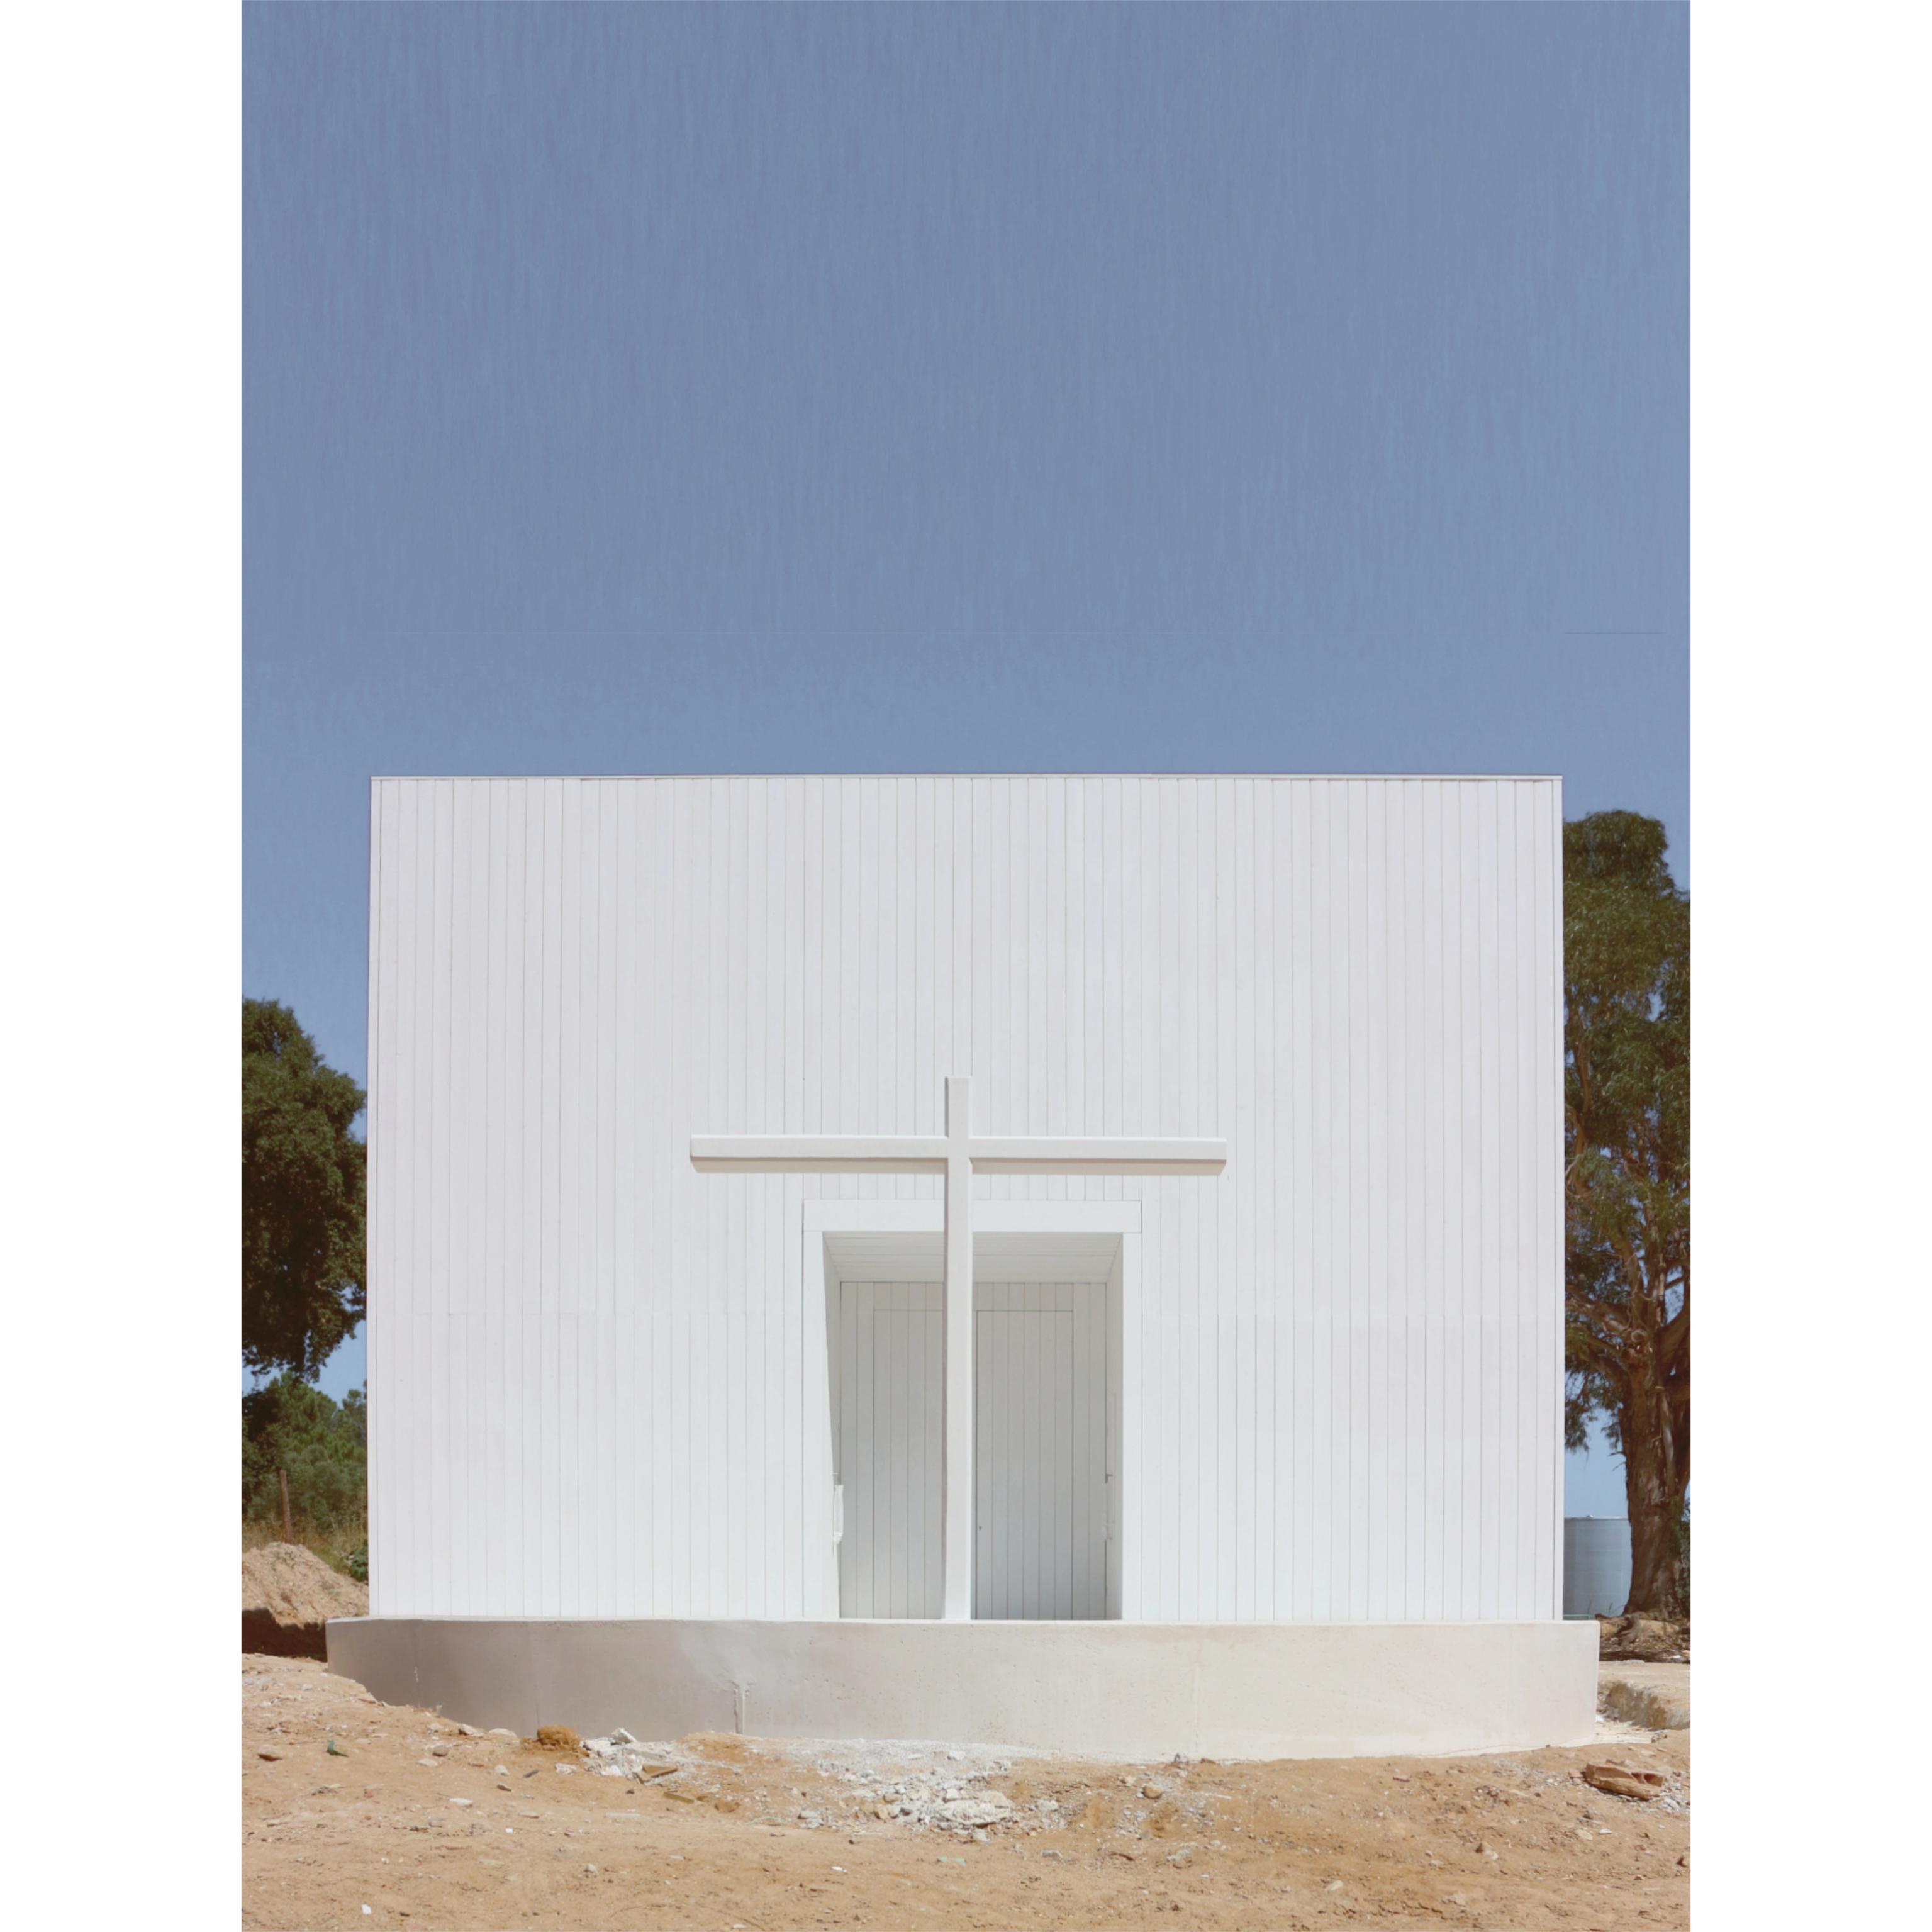 SAMI-wallpaper_house-01